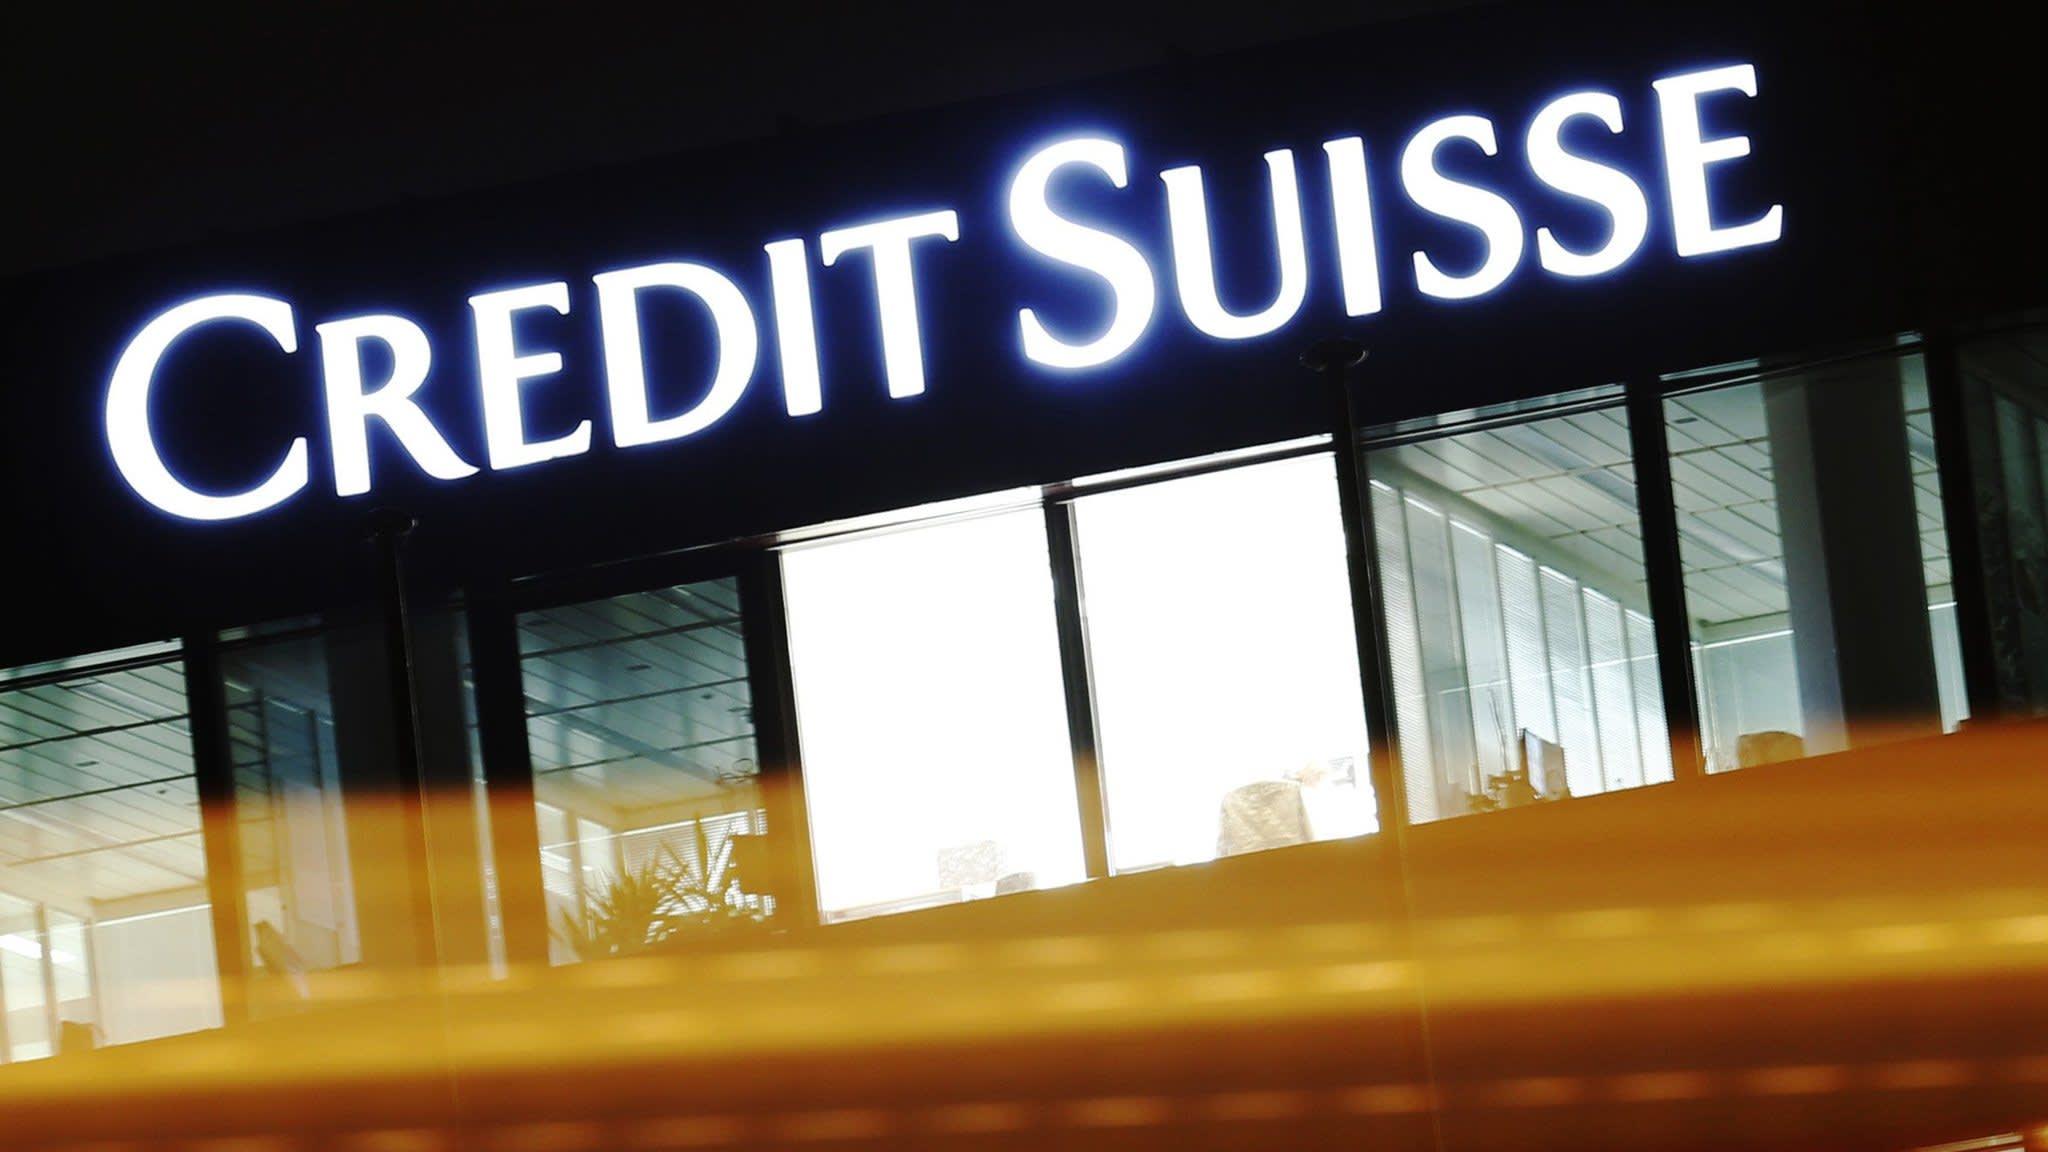 Market volatility boosts revenue at Credit Suisse